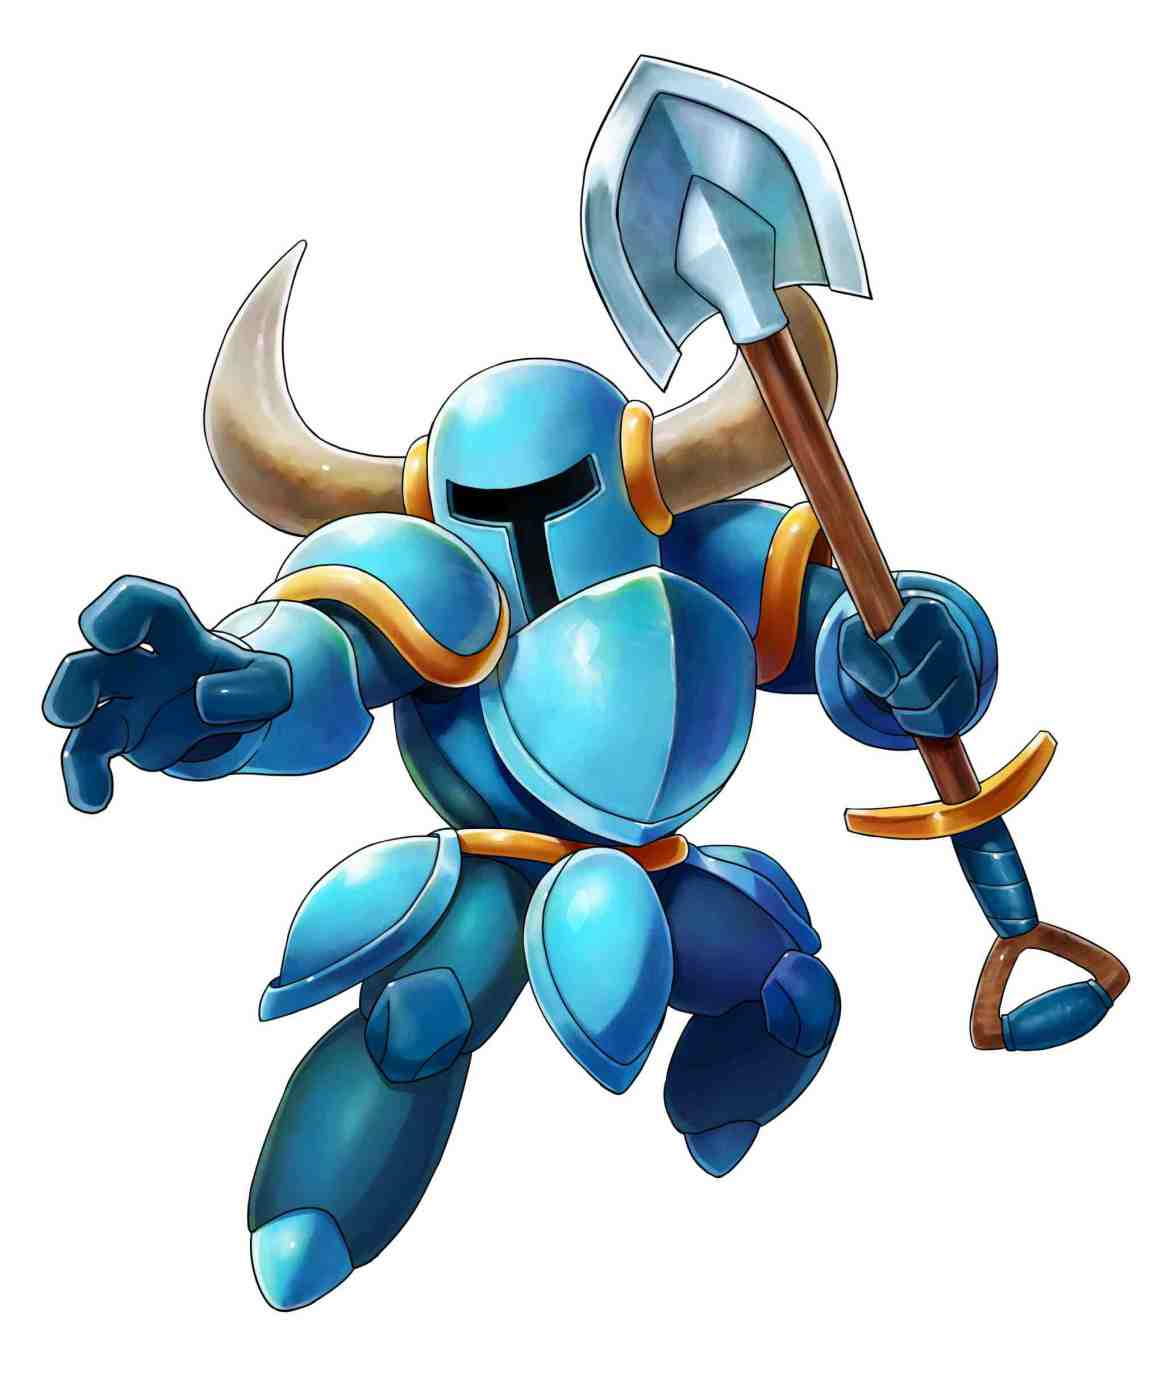 shovel-knight-blaster-master-zero-artwork